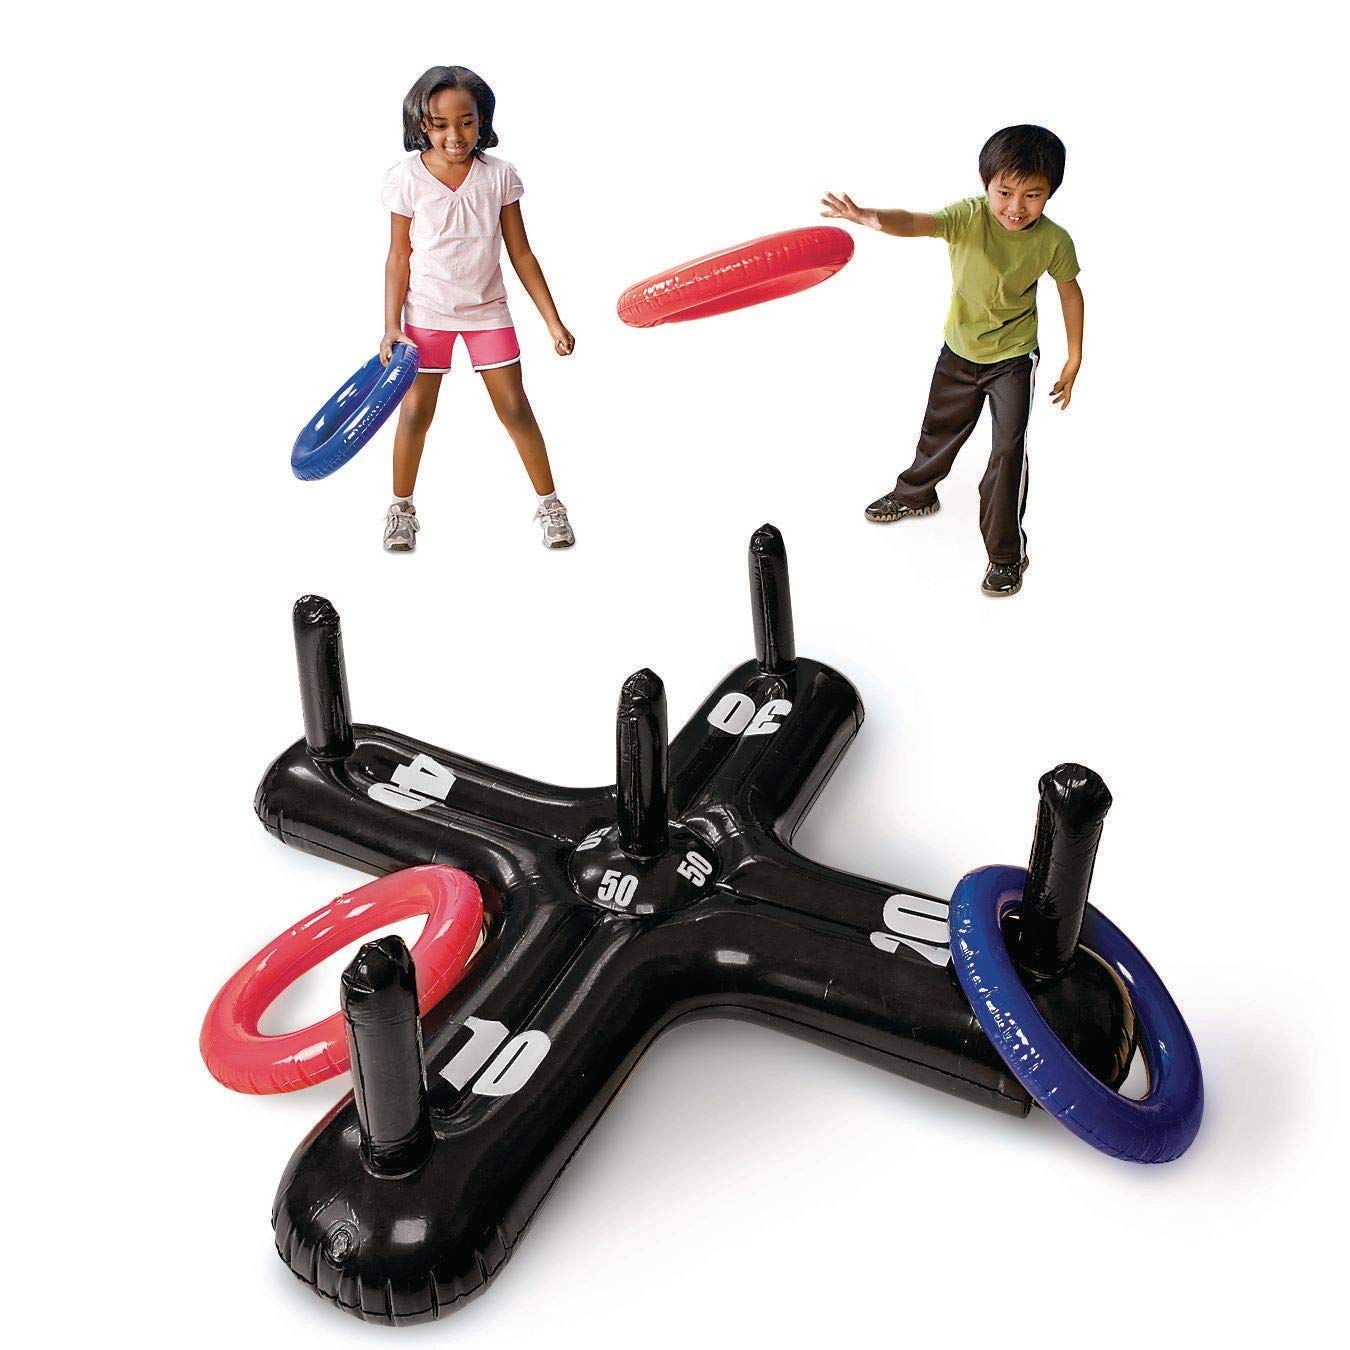 S&S Worldwide Jumbo Inflatable Ring Toss by S&S Worldwide